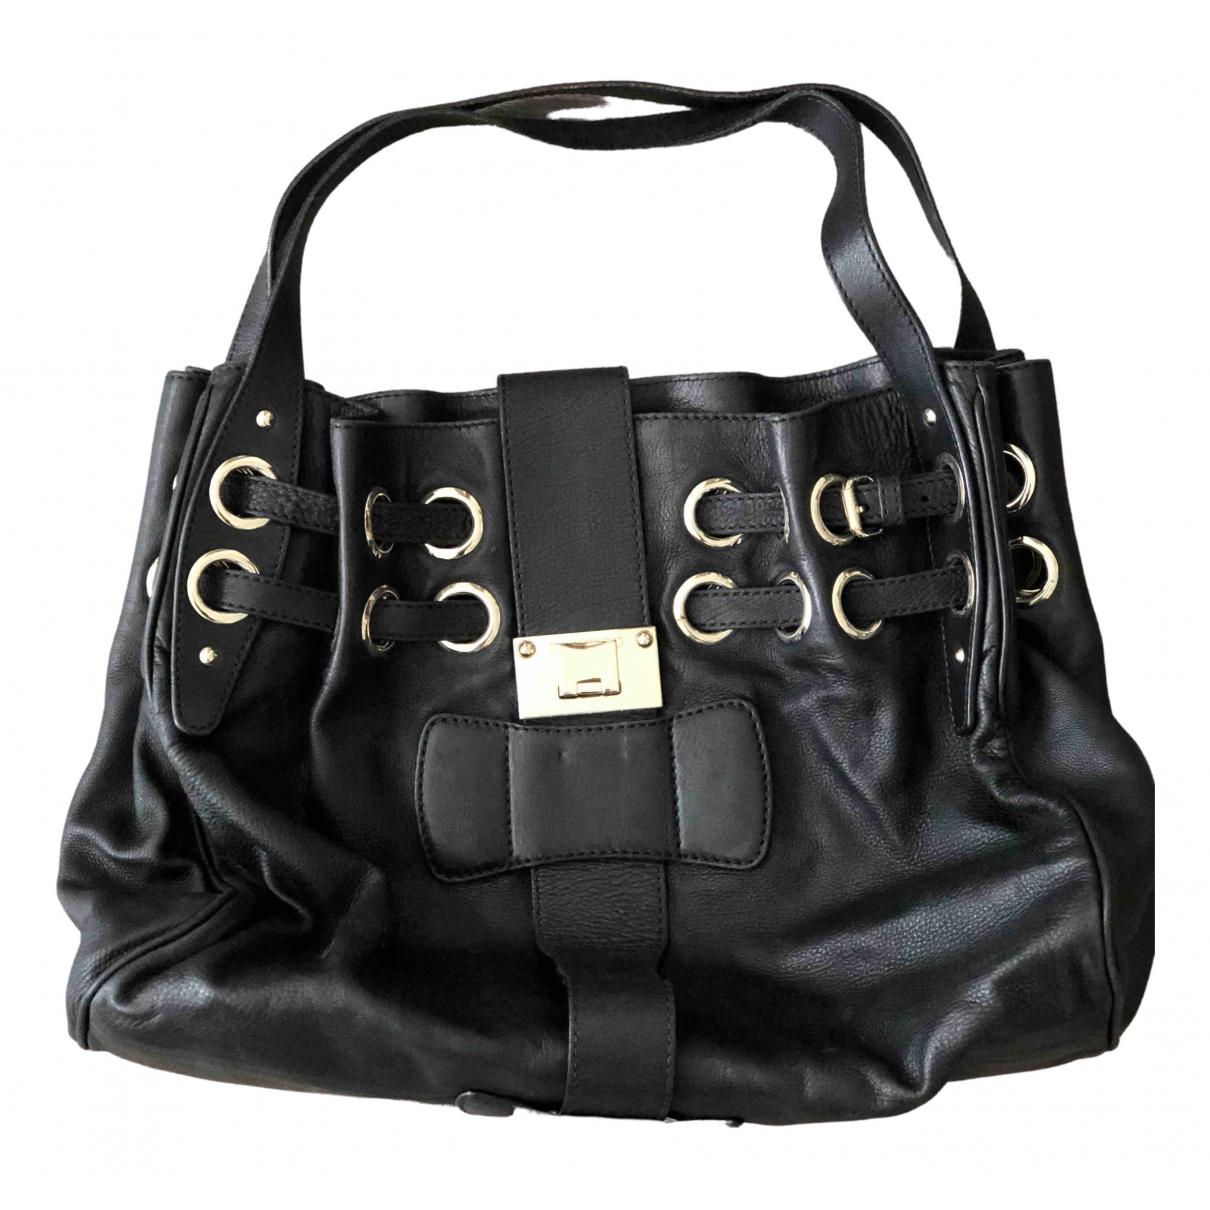 Jimmy Choo \N Black Leather handbag for Women \N